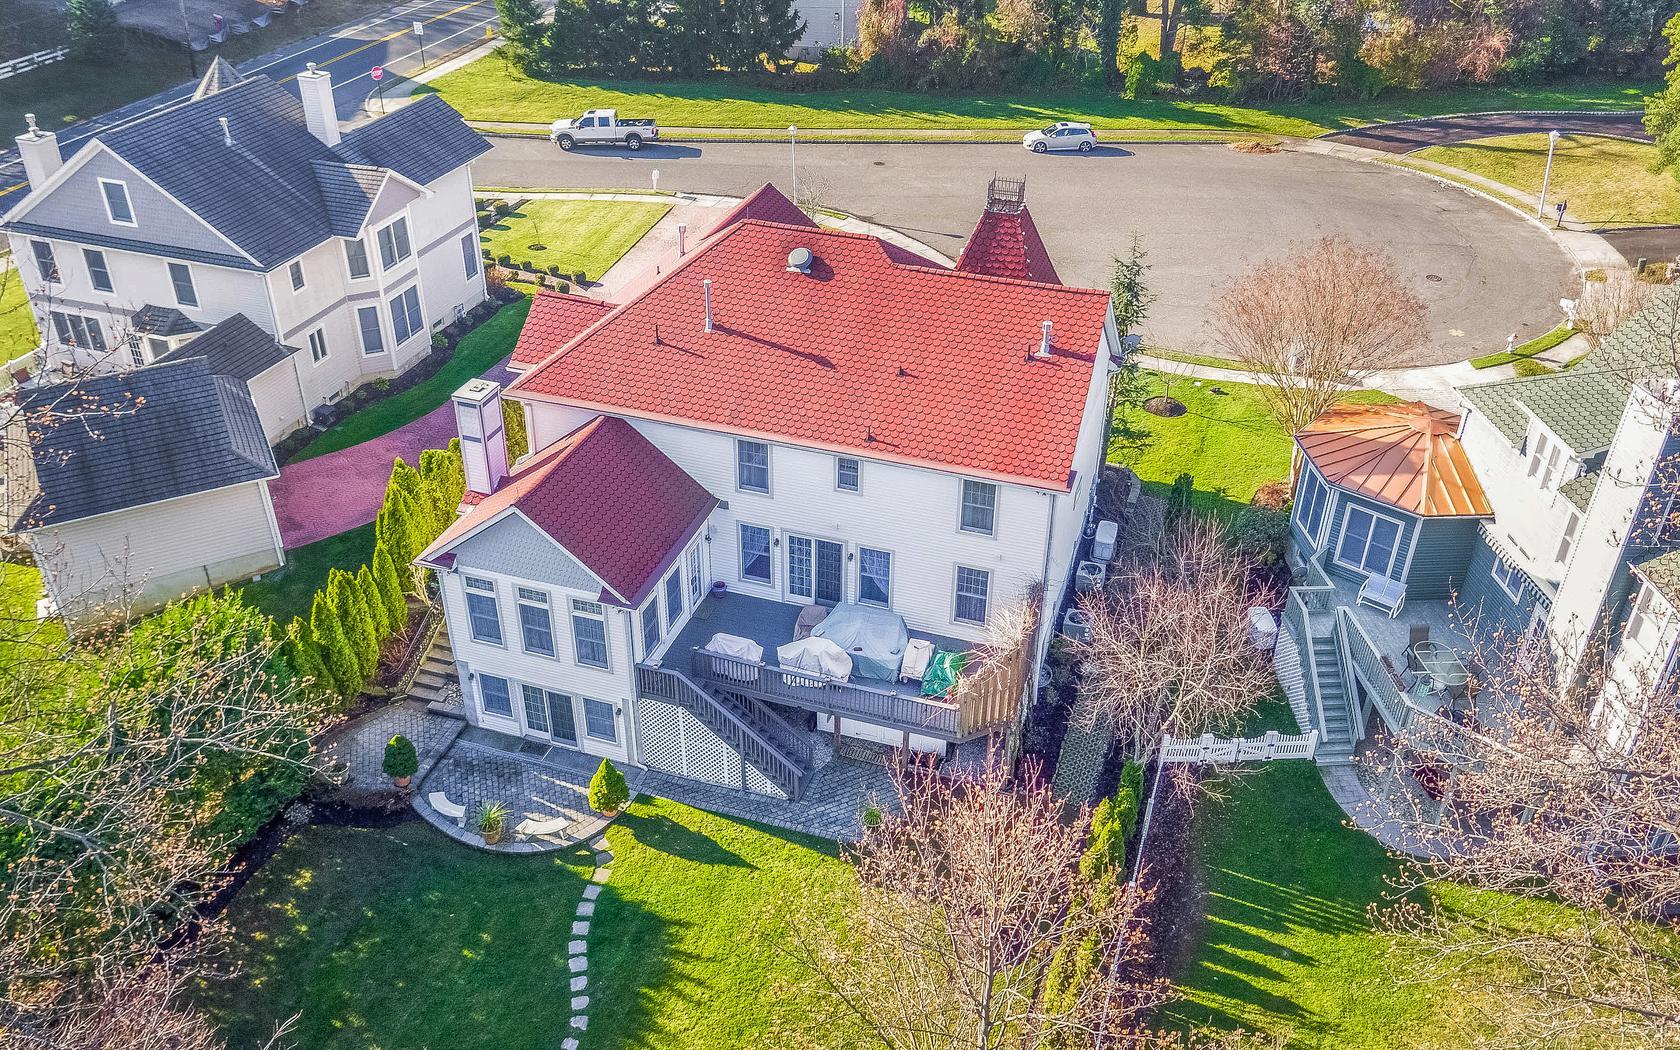 Casa para uma família para Venda às Victorian 4 Captain Bailey Court Brielle, Nova Jersey, 08730 Estados Unidos